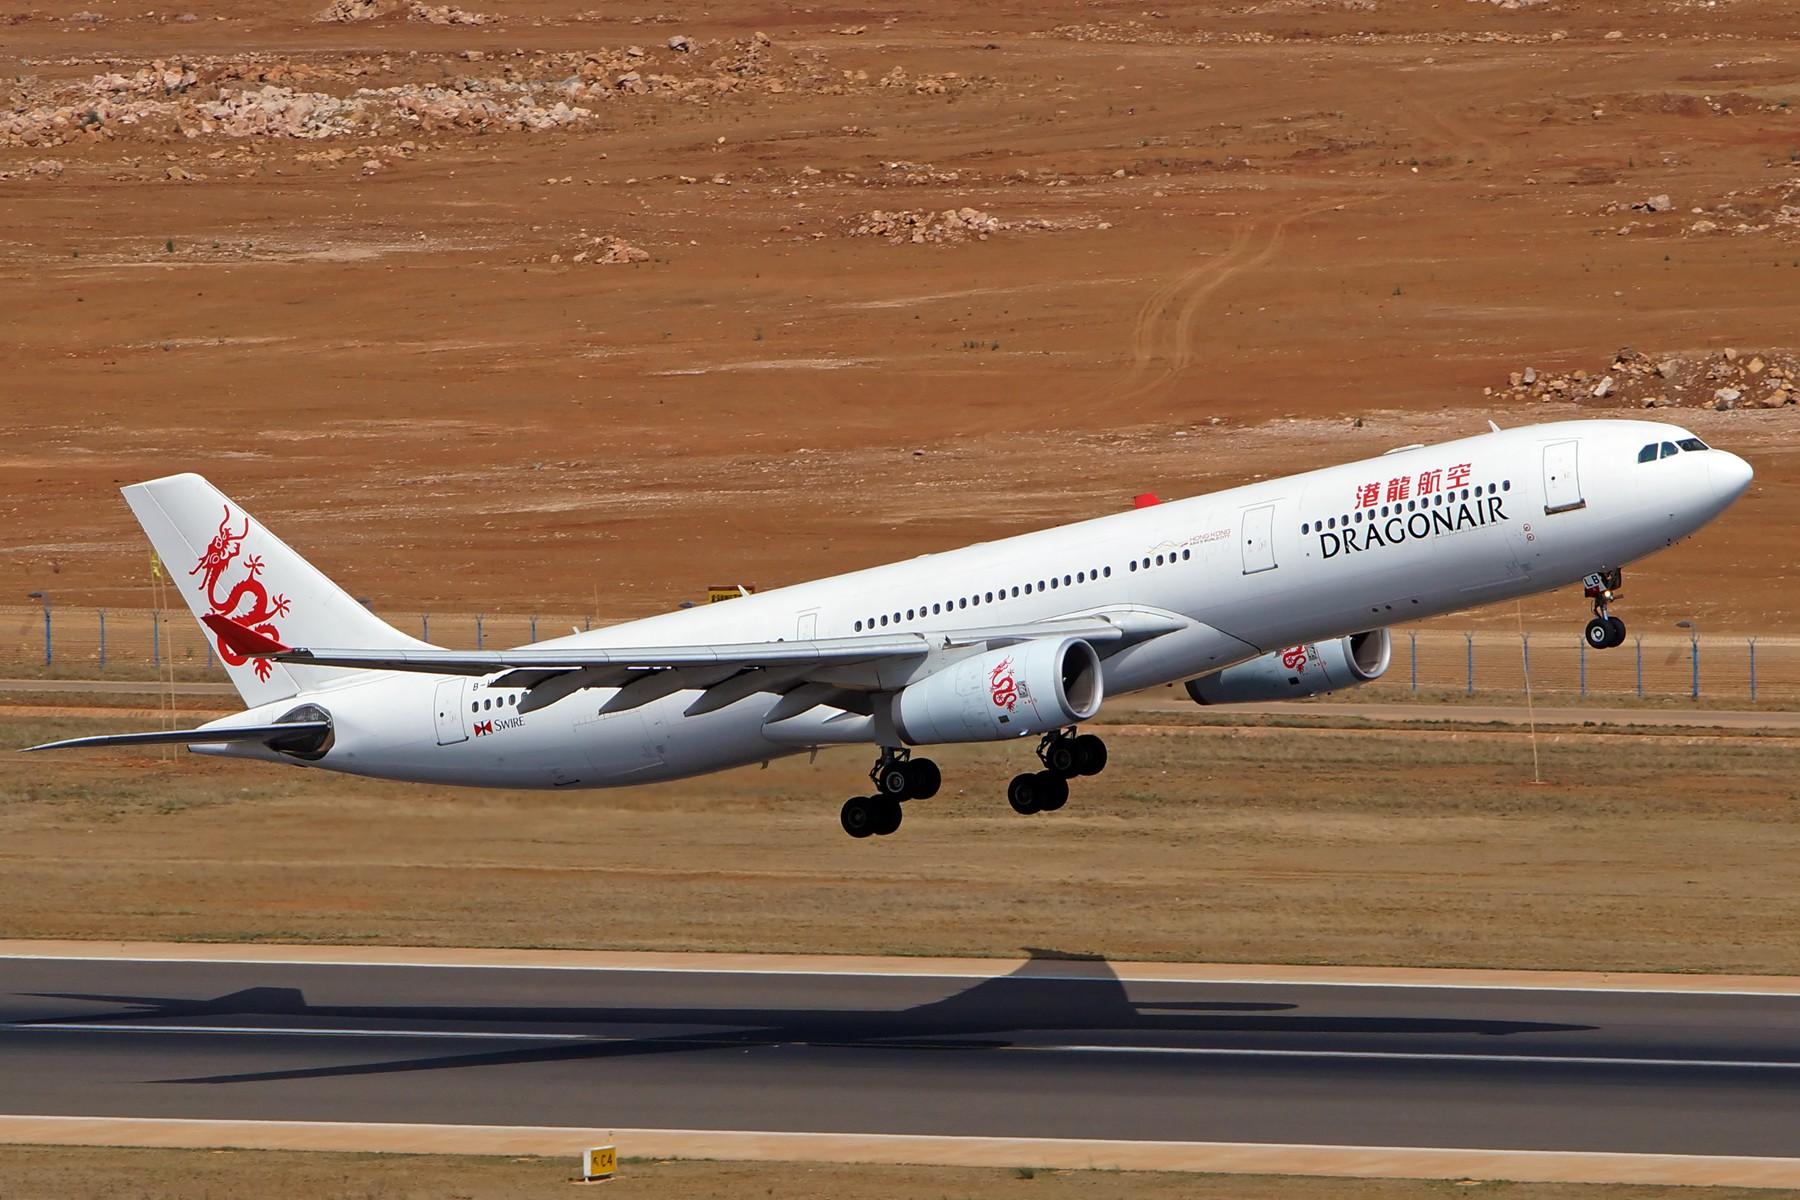 Re:[原创][Andrei] ------- 素颜也美丽,港龙330篇 AIRBUS A330-300 B-HLB 中国昆明长水机场